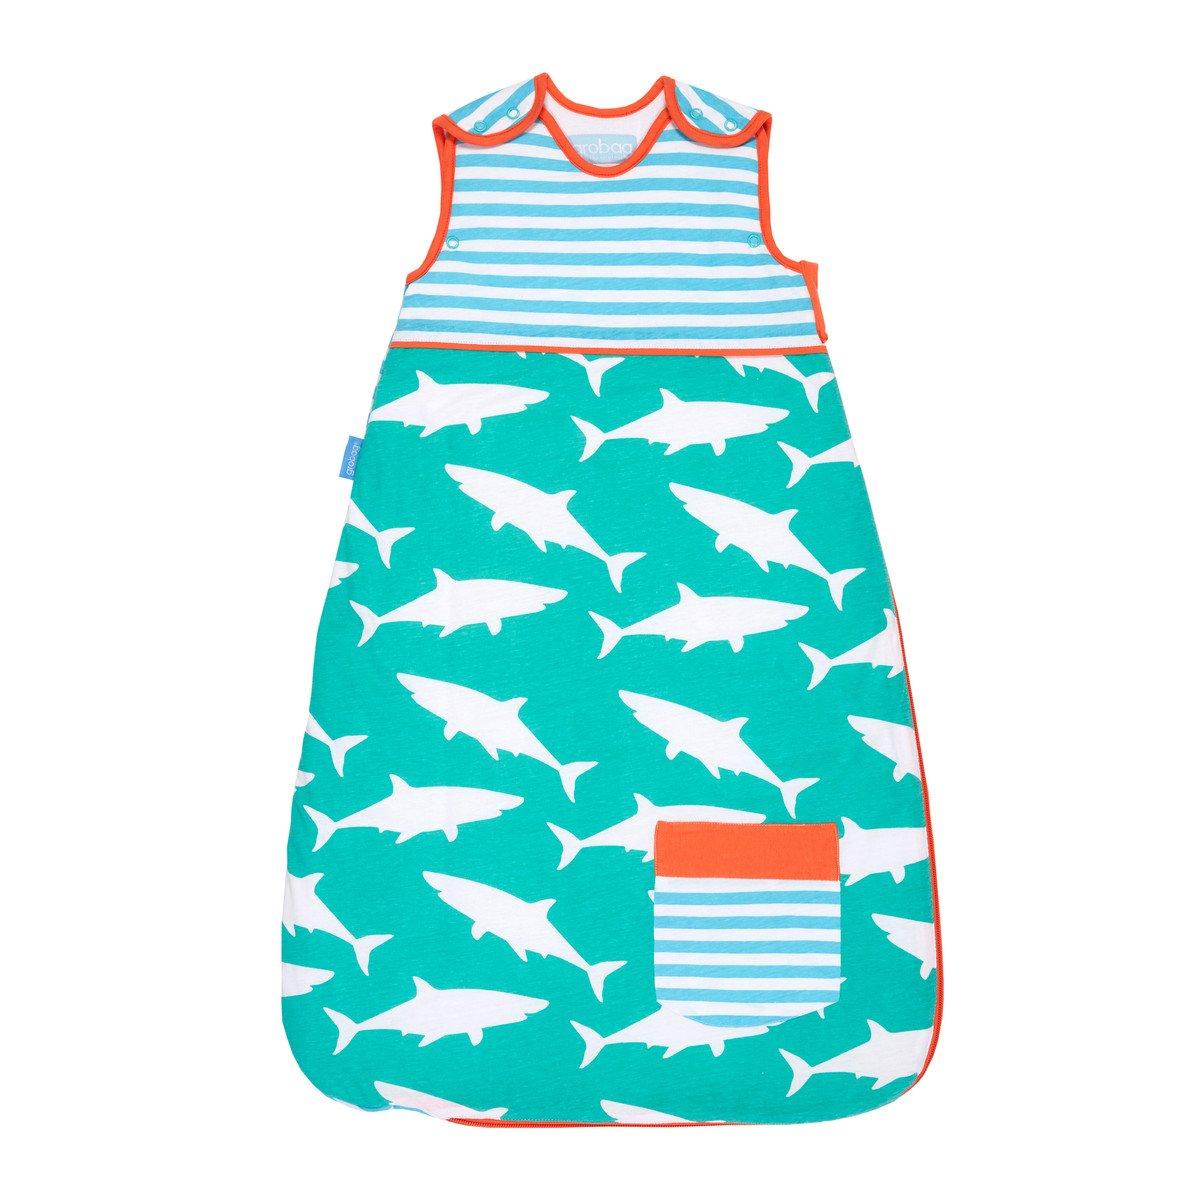 El Gro Company 0 - 6 meses, Grobag - Saco de dormir bolsa azul Talla:0-6 meses: Amazon.es: Bebé